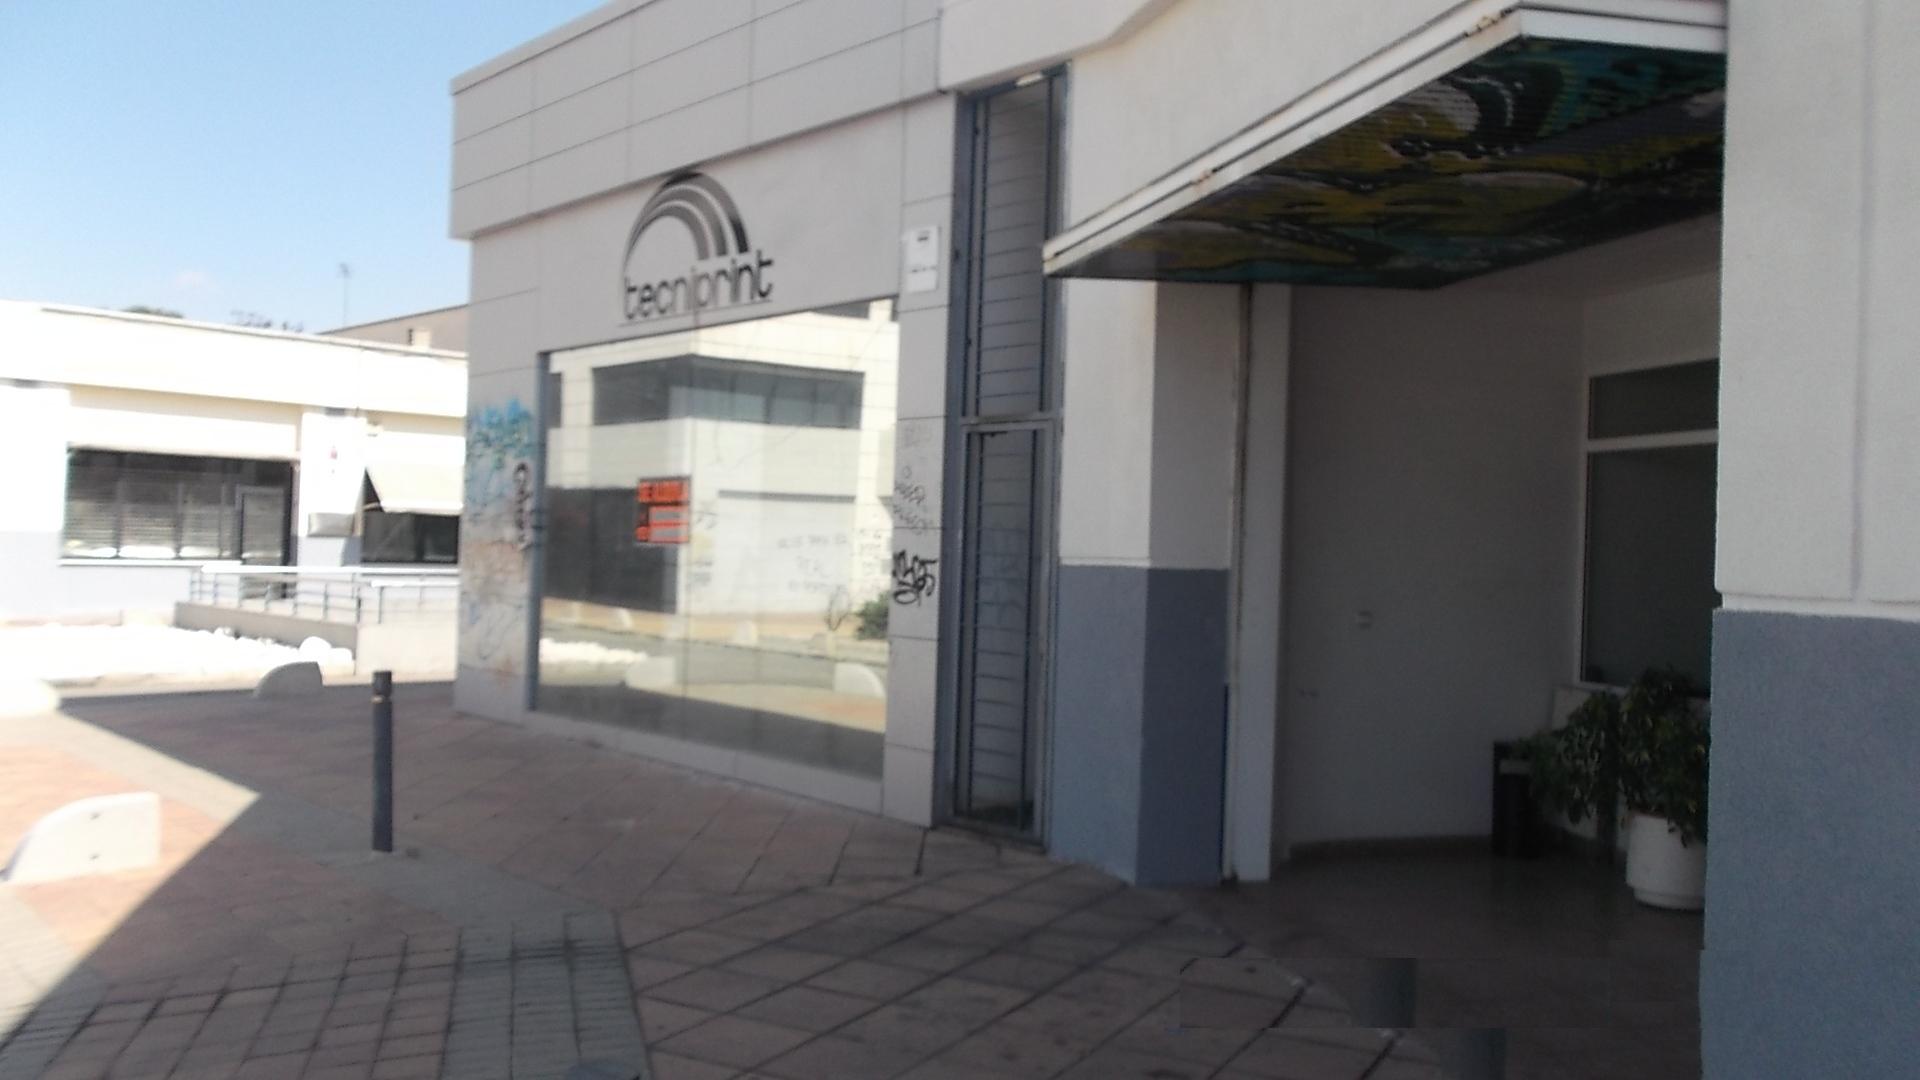 Oficina en Murcia (M79546) - foto2